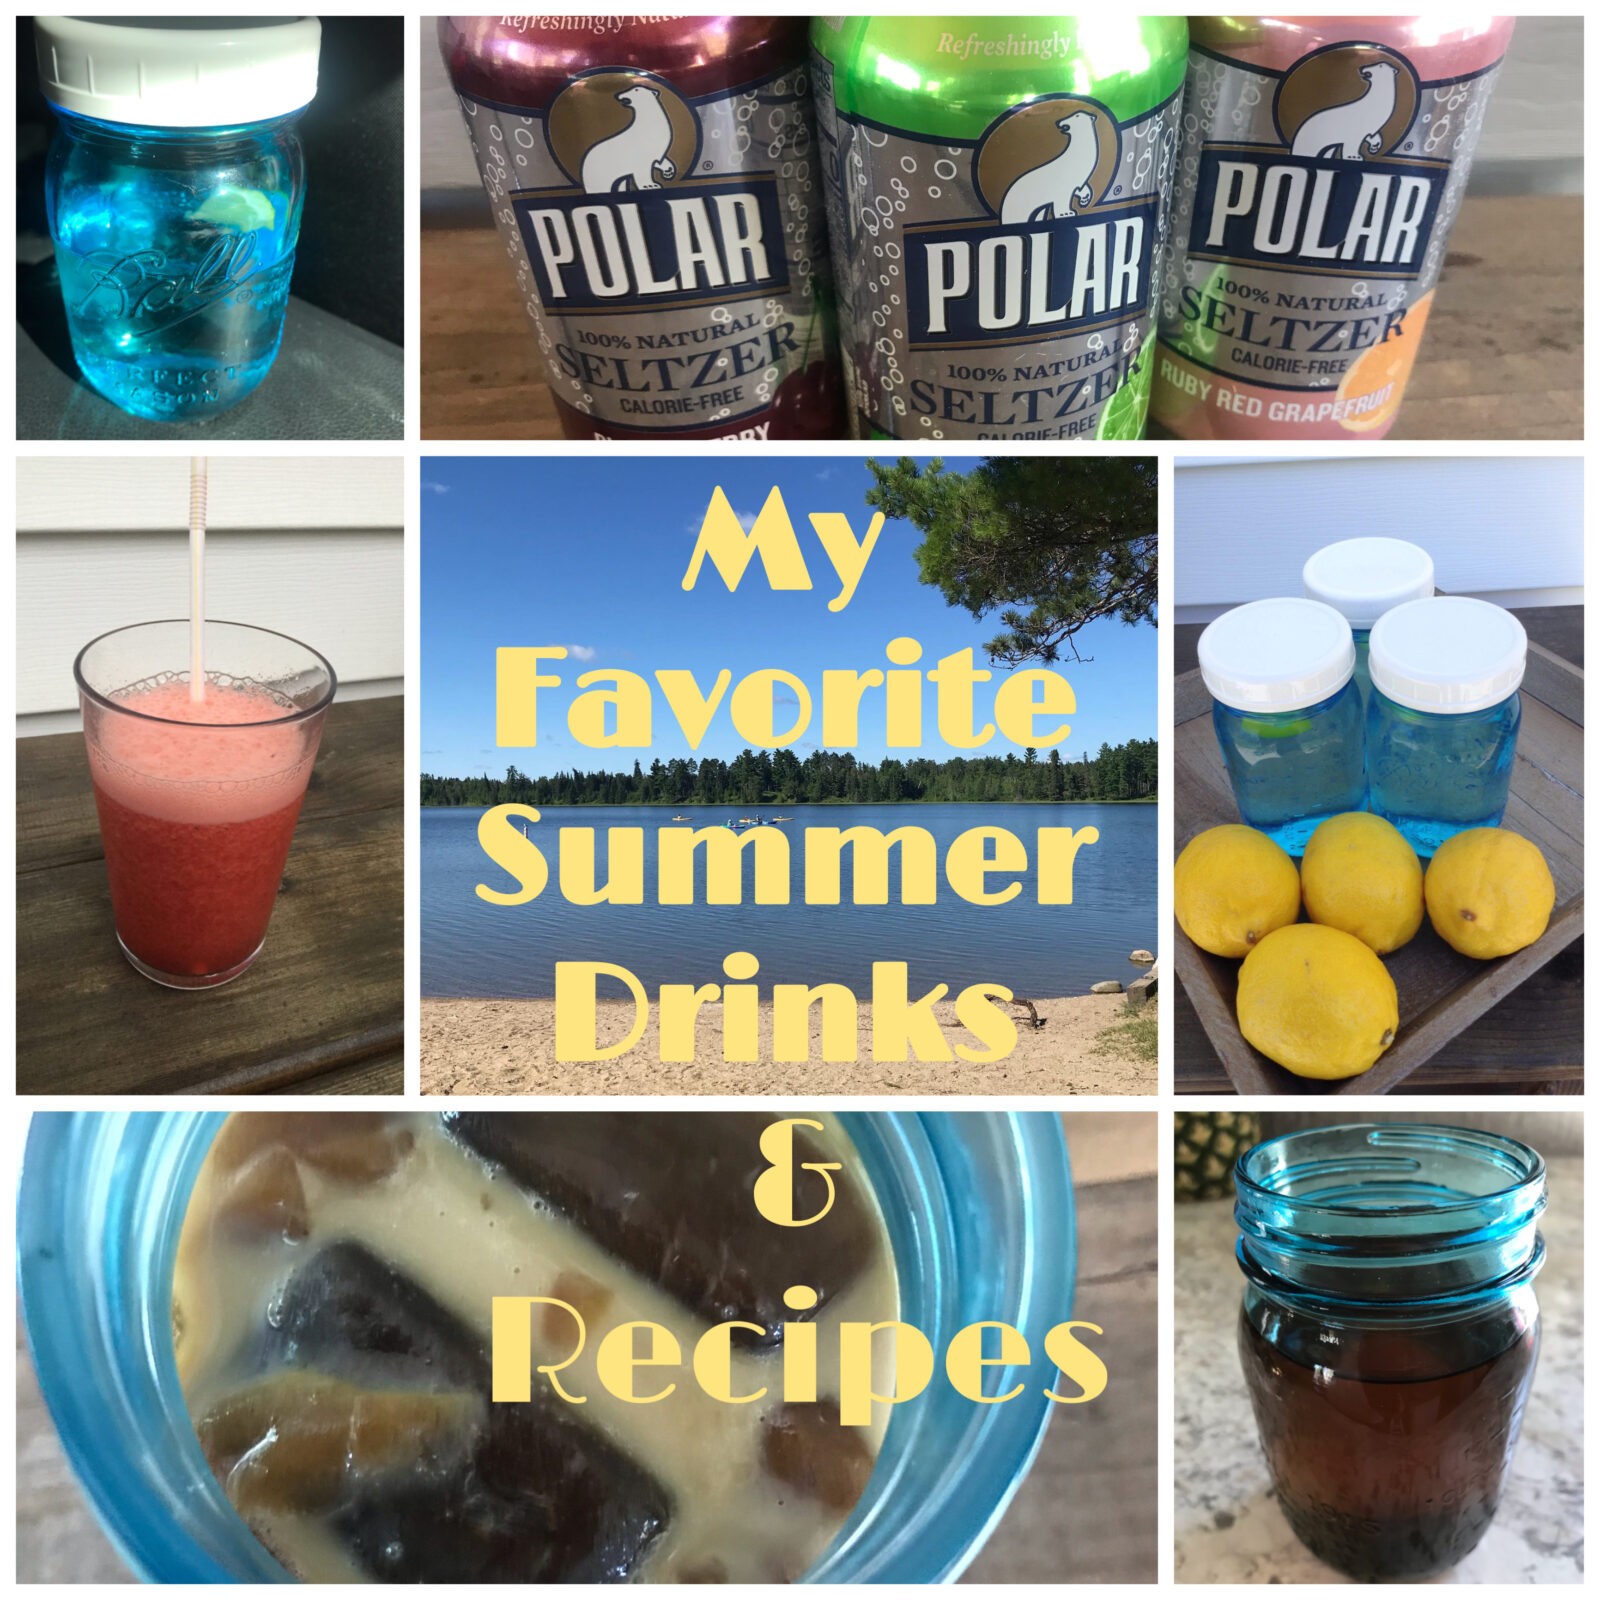 My Favorite Summer Drinks